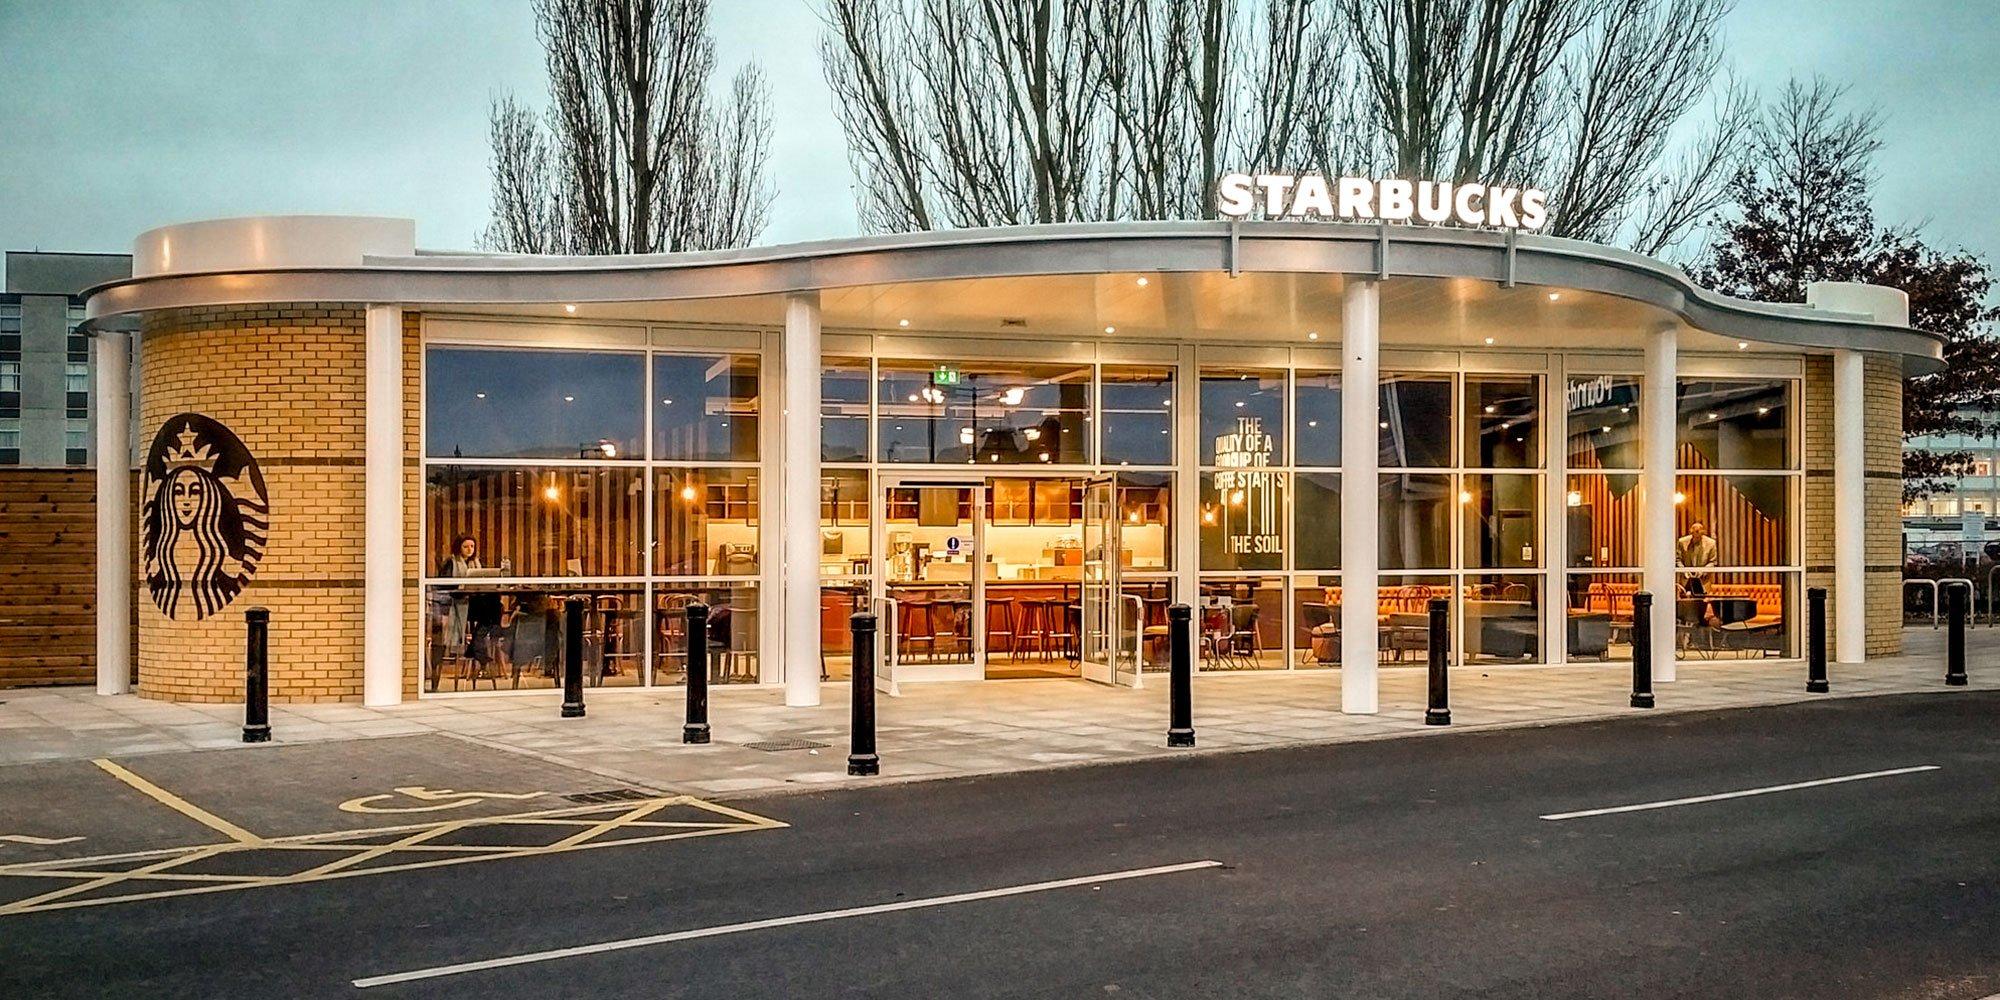 Starbucks, Colchester